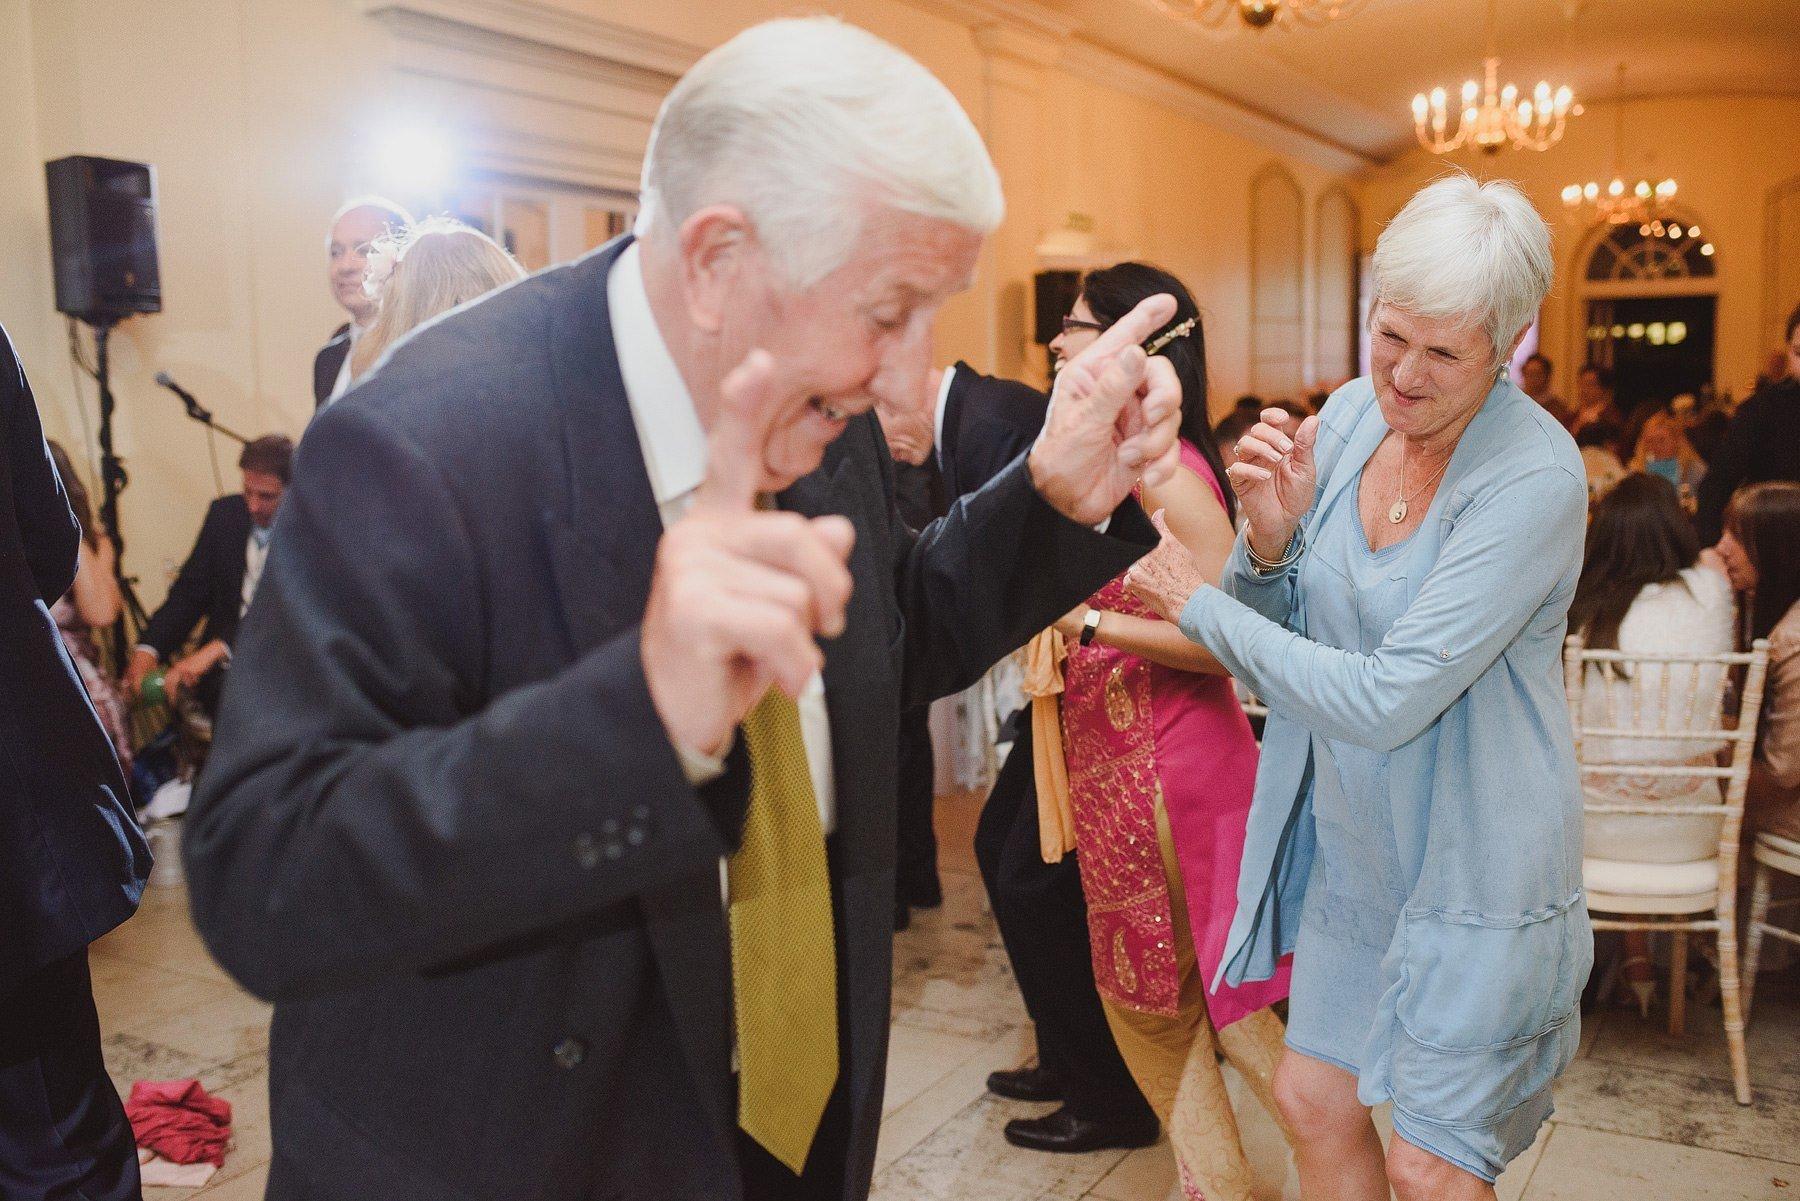 wedding photographer goldney hall